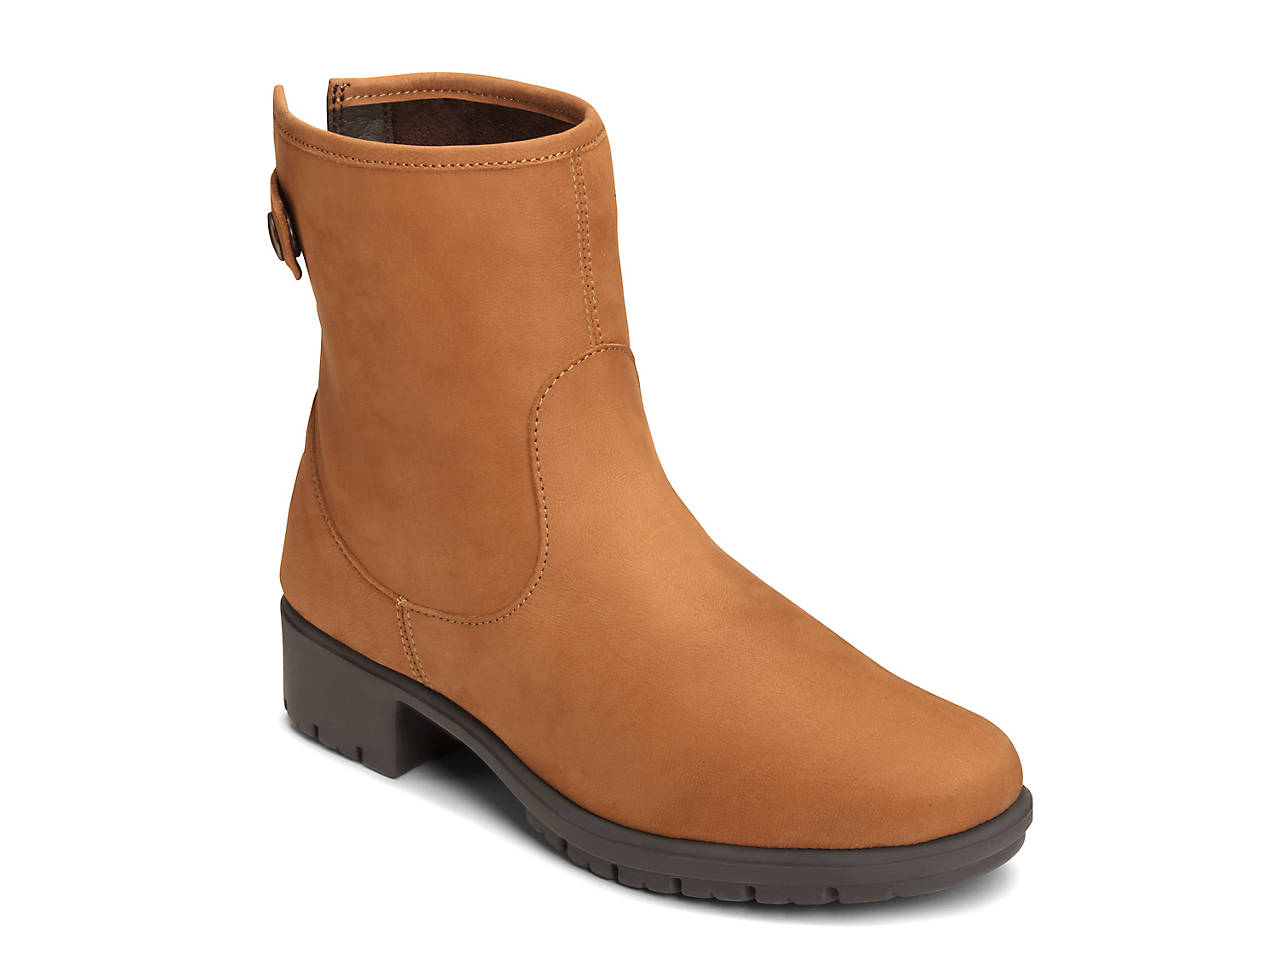 Aerosoles Just Kidding Ankle Boot(Women's) -Dark Tan Nubuck Sale Deals VT5KAtd